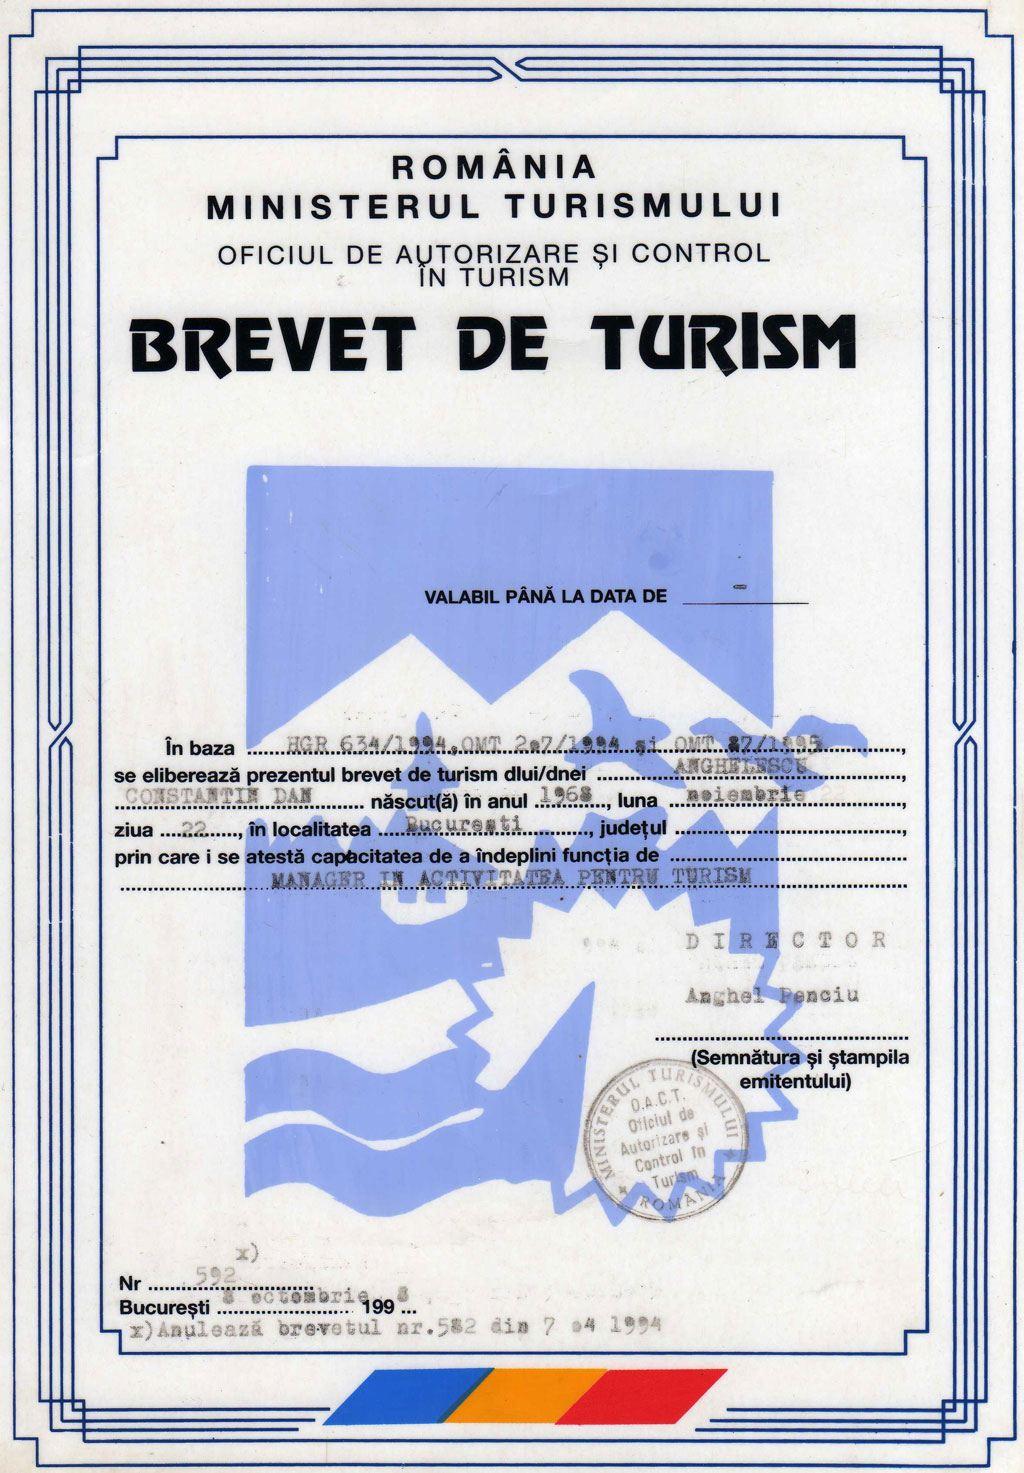 BREVET Turism Dan ANGHELESCU